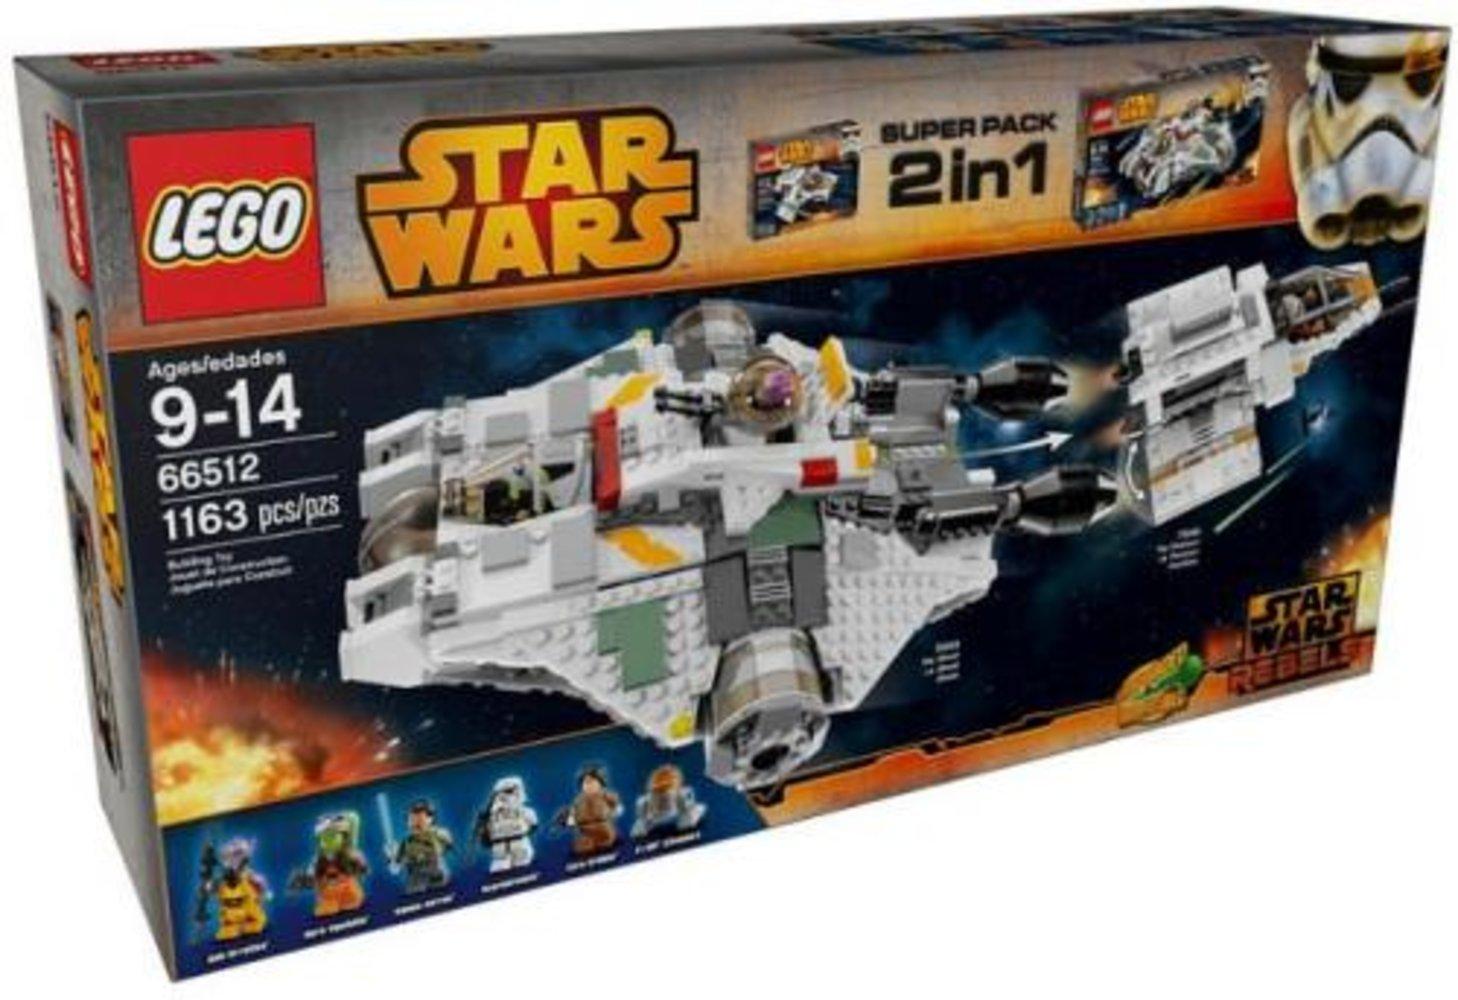 Star Wars Super Pack 2 in 1 (75048, 75053)